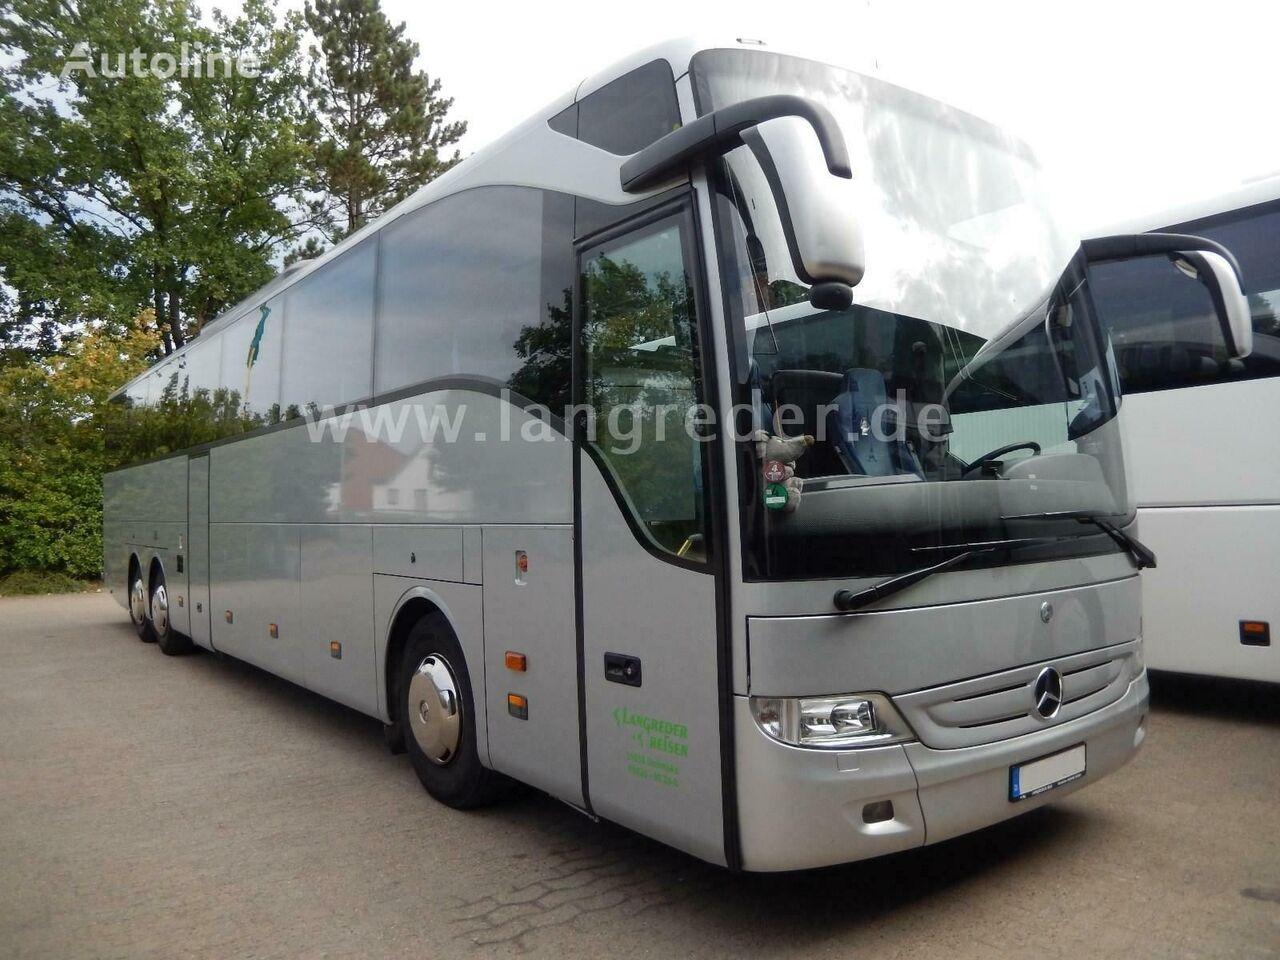 MERCEDES-BENZ Tourismo RHD-L touringcar